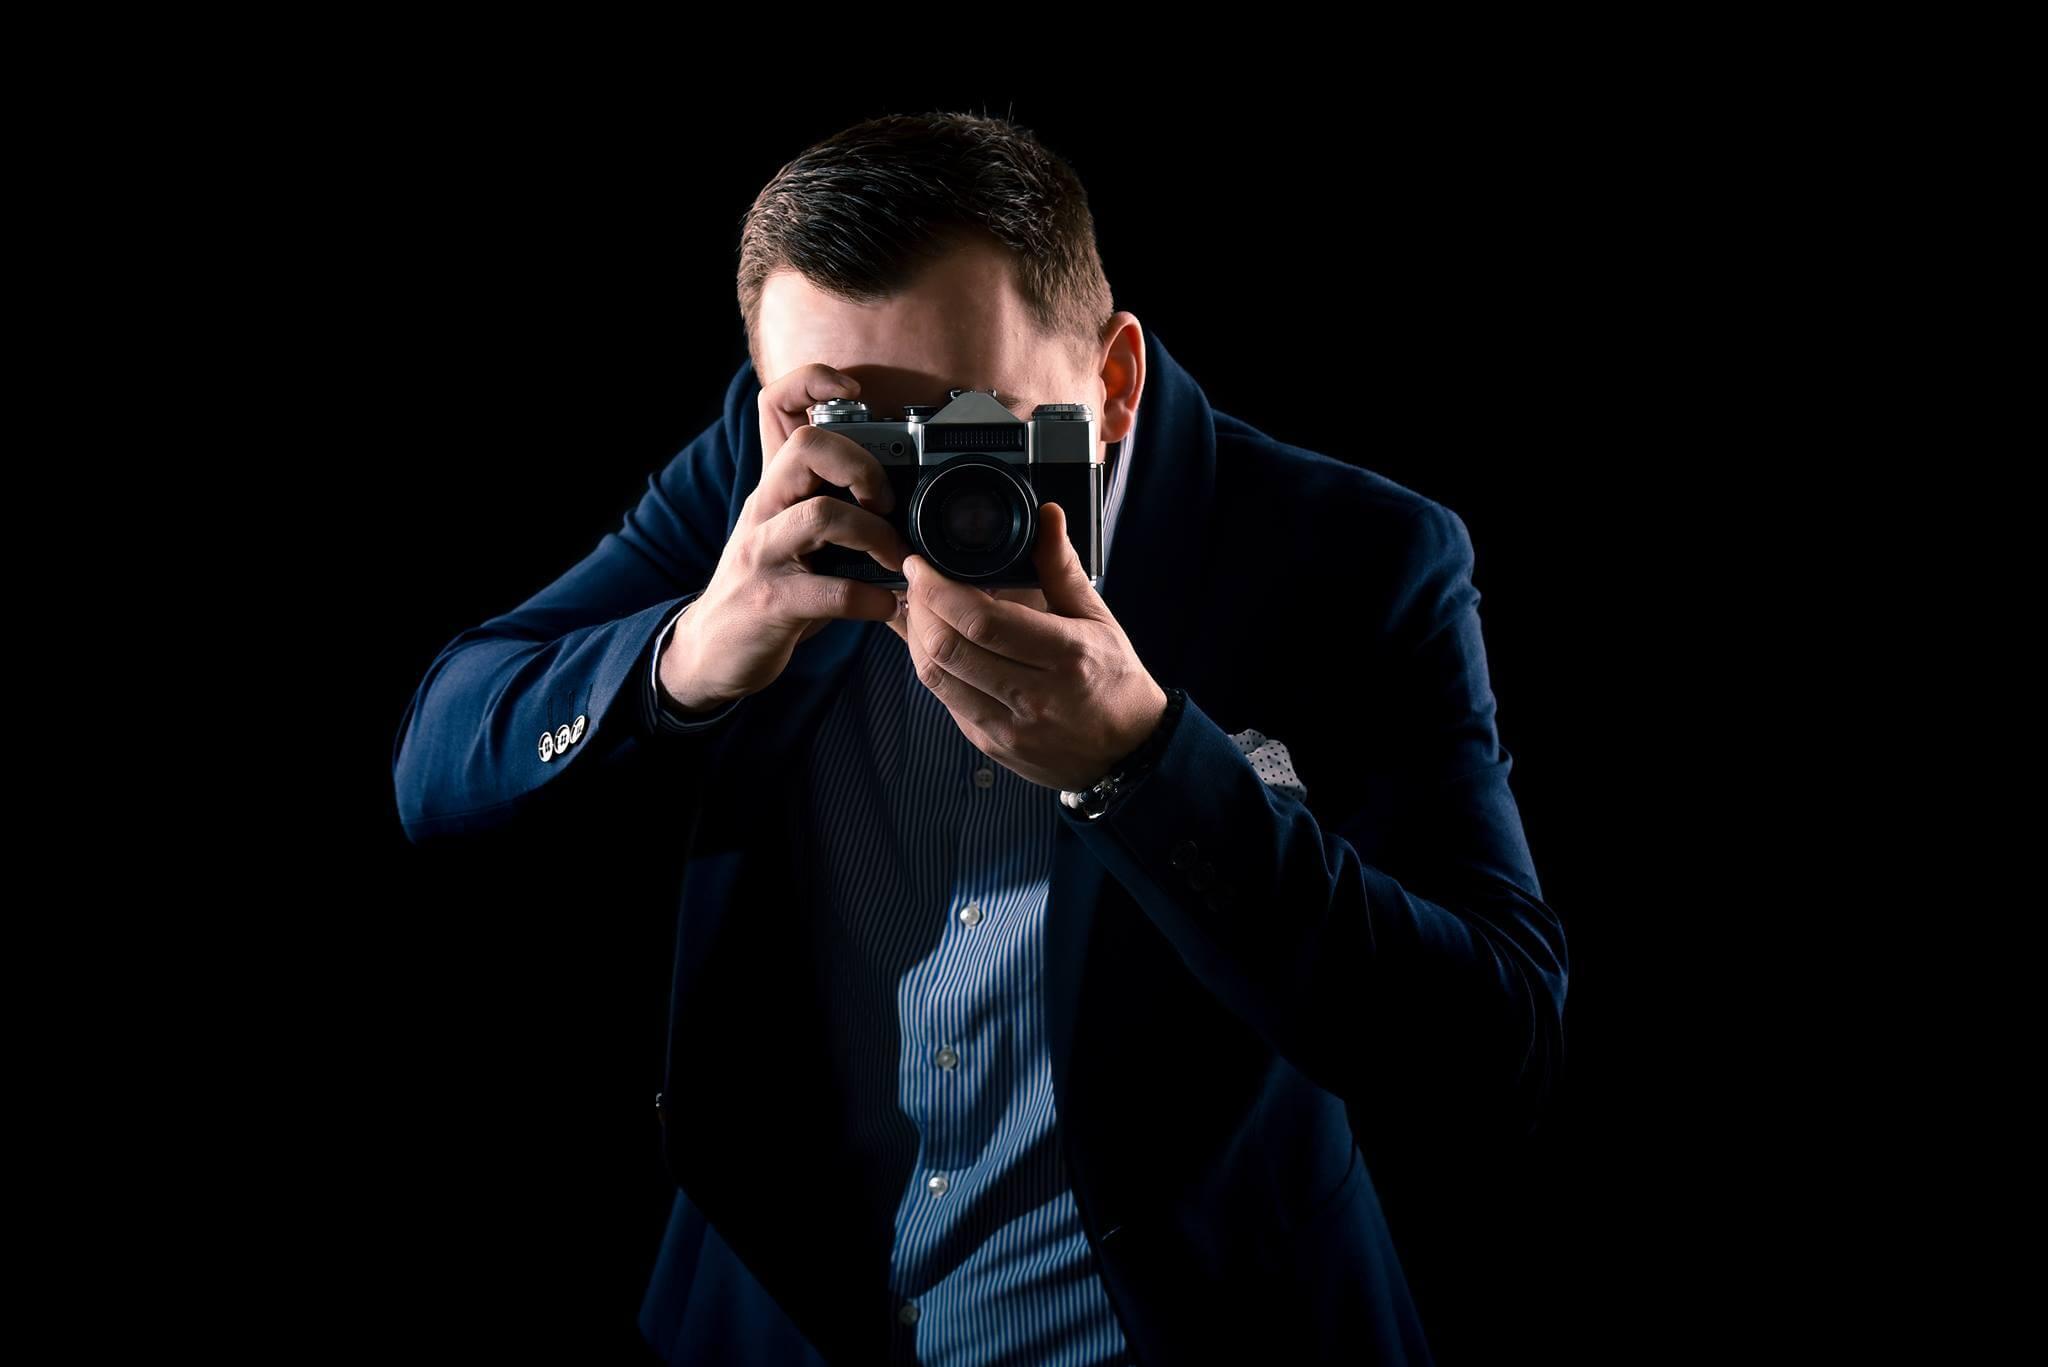 David-Faic-Tabor-Fotograf